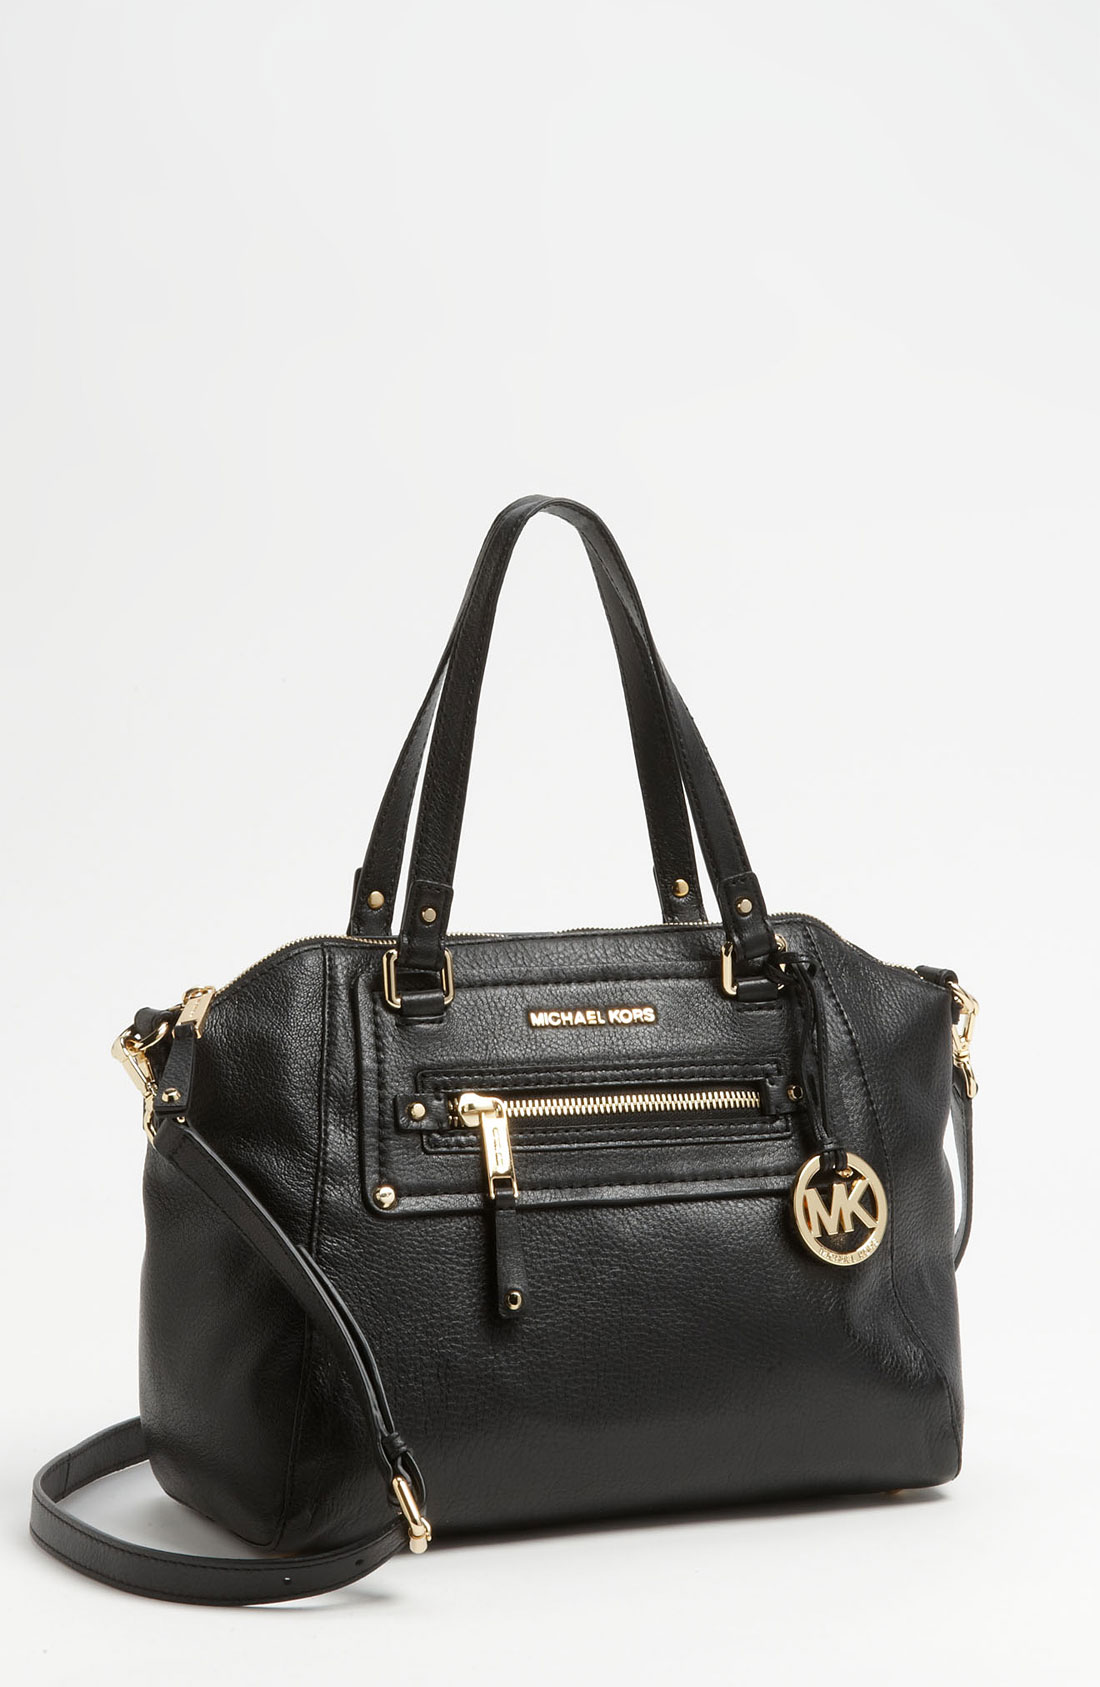 8490236b6ccb ... crossbody purse vkfsn8gi uk lyst michael michael kors gilmore medium  satchel in brown fb6a7 5a137 ...